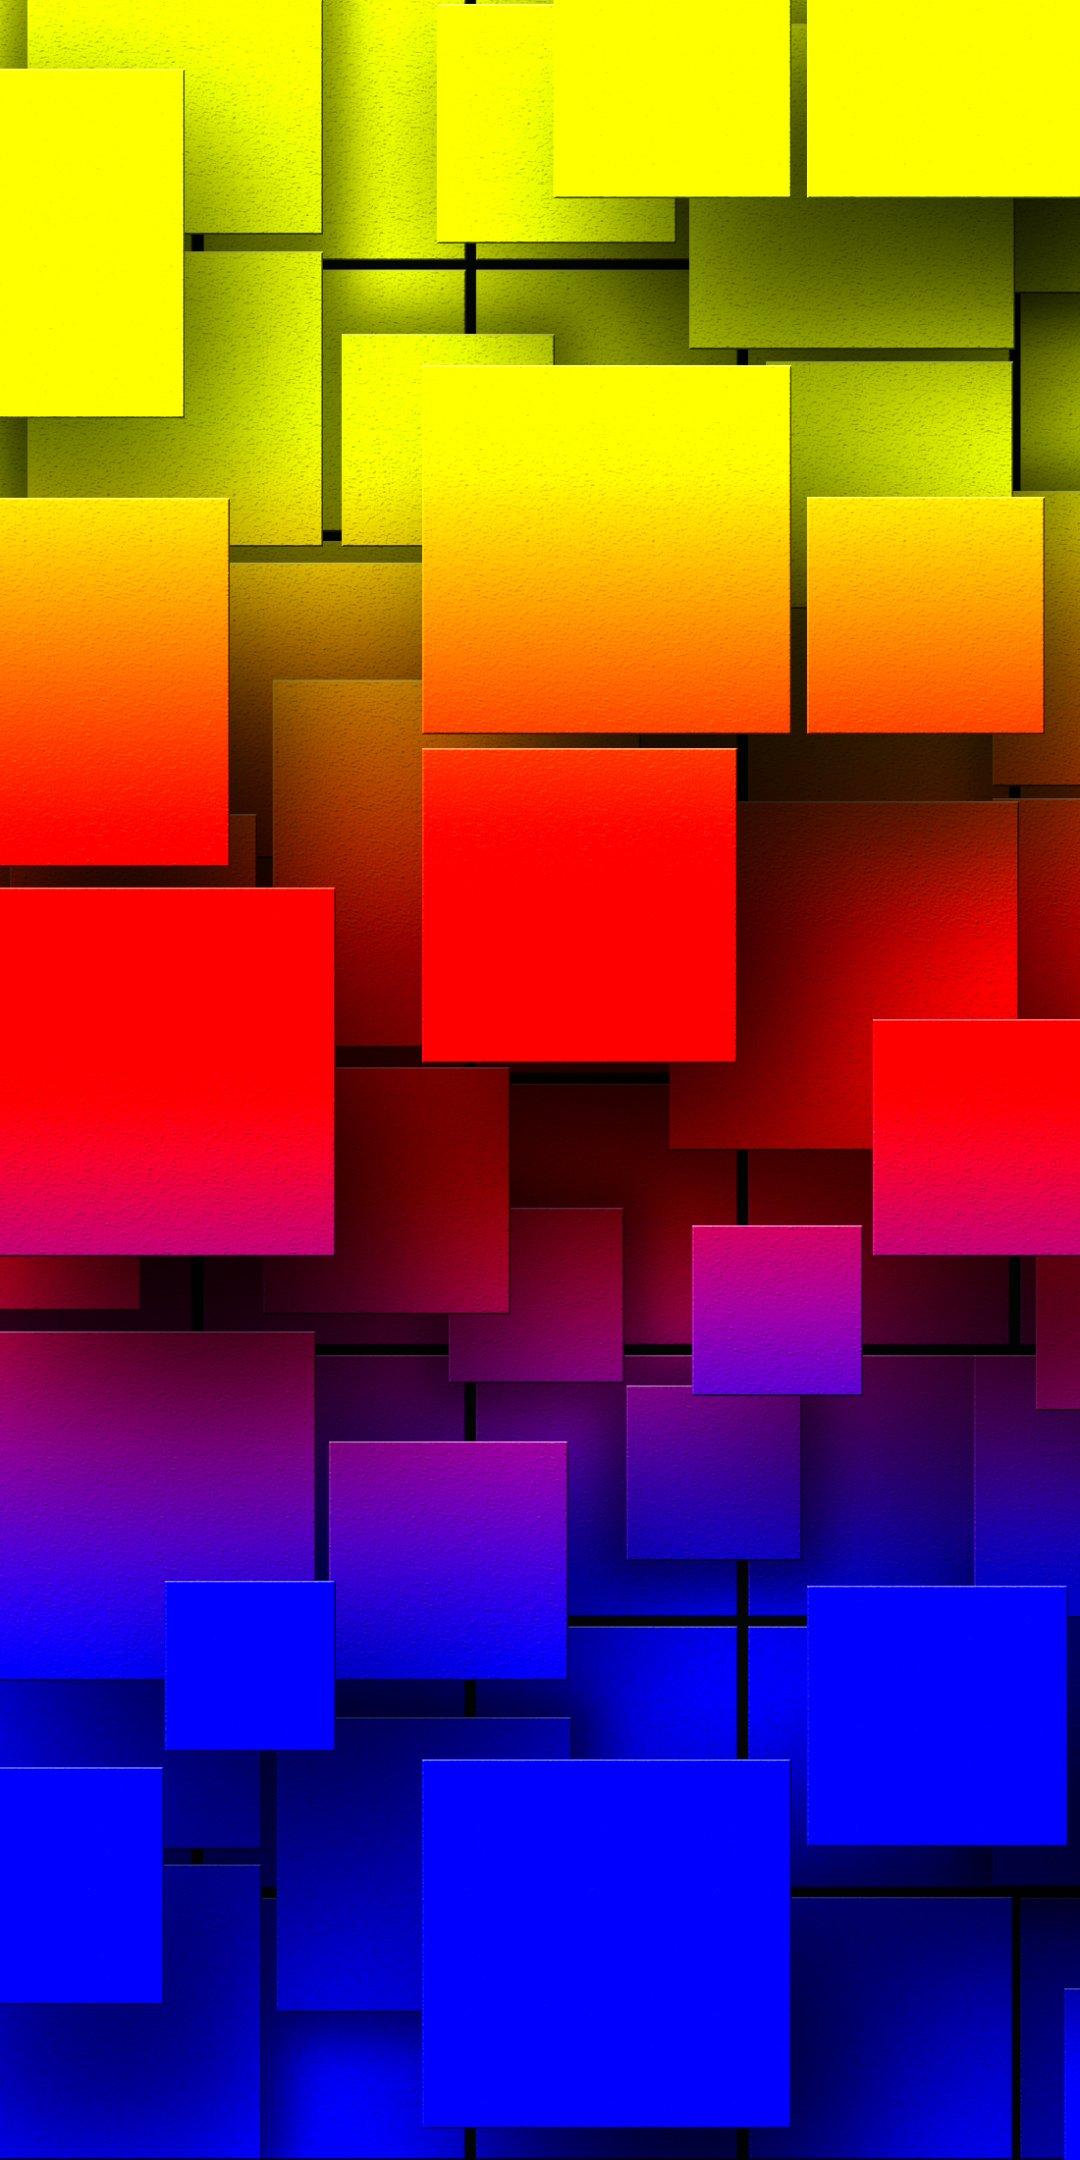 Wallpaper 879063